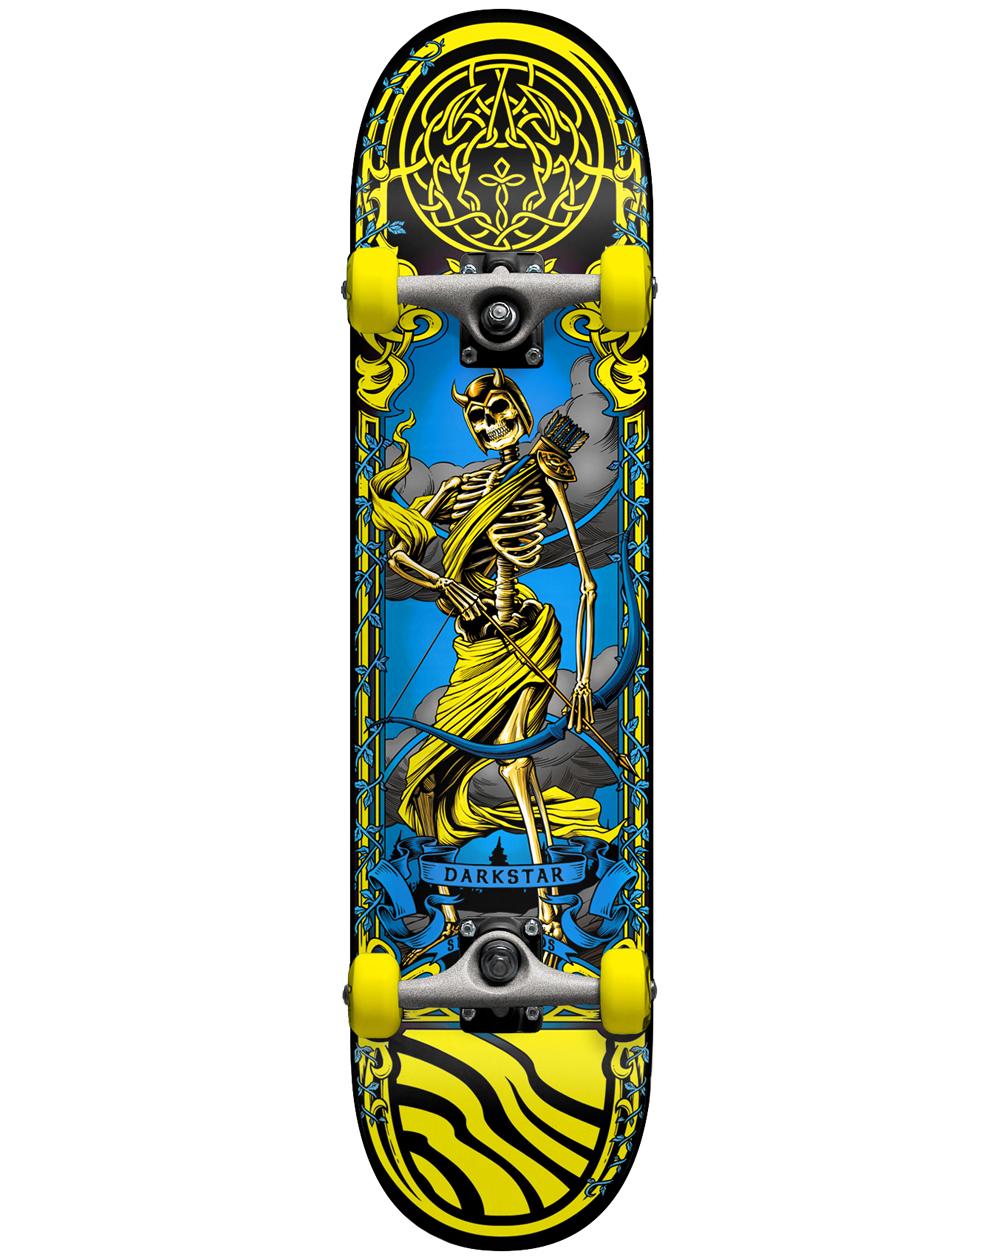 "Darkstar Arrow 7.5"" Complete Skateboard Yellow"